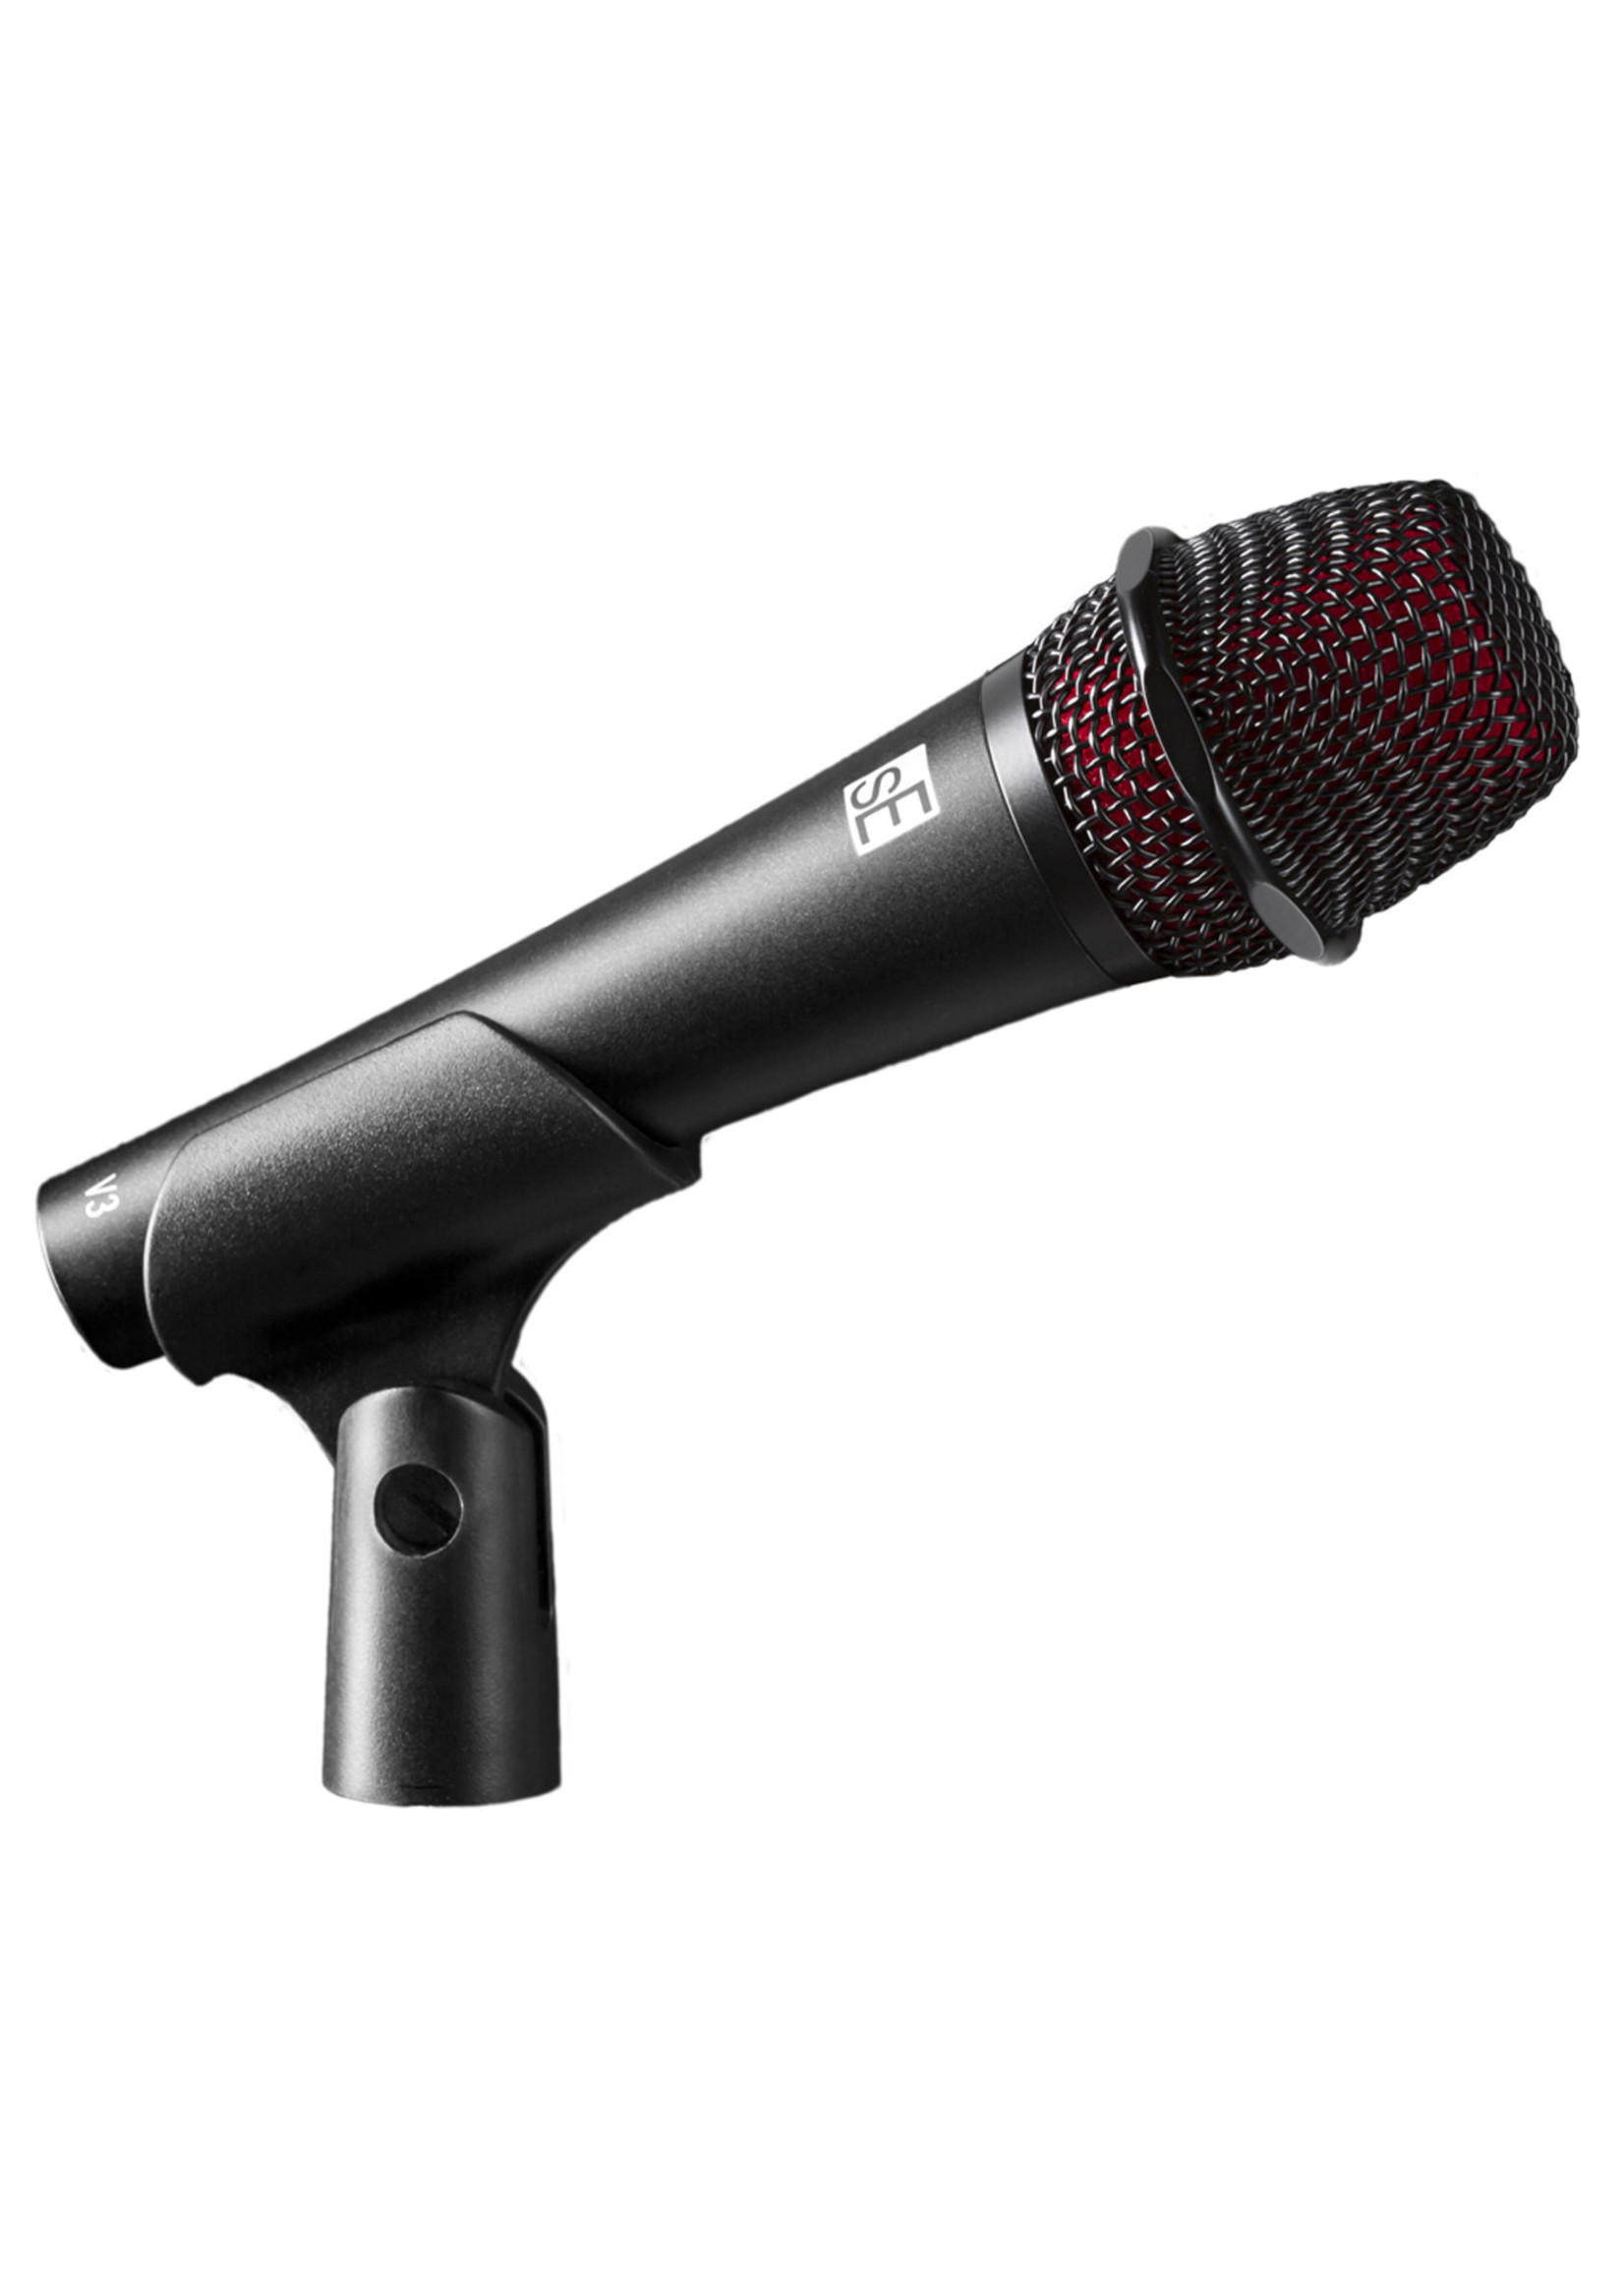 SE sE V3 Dynamic Microphone